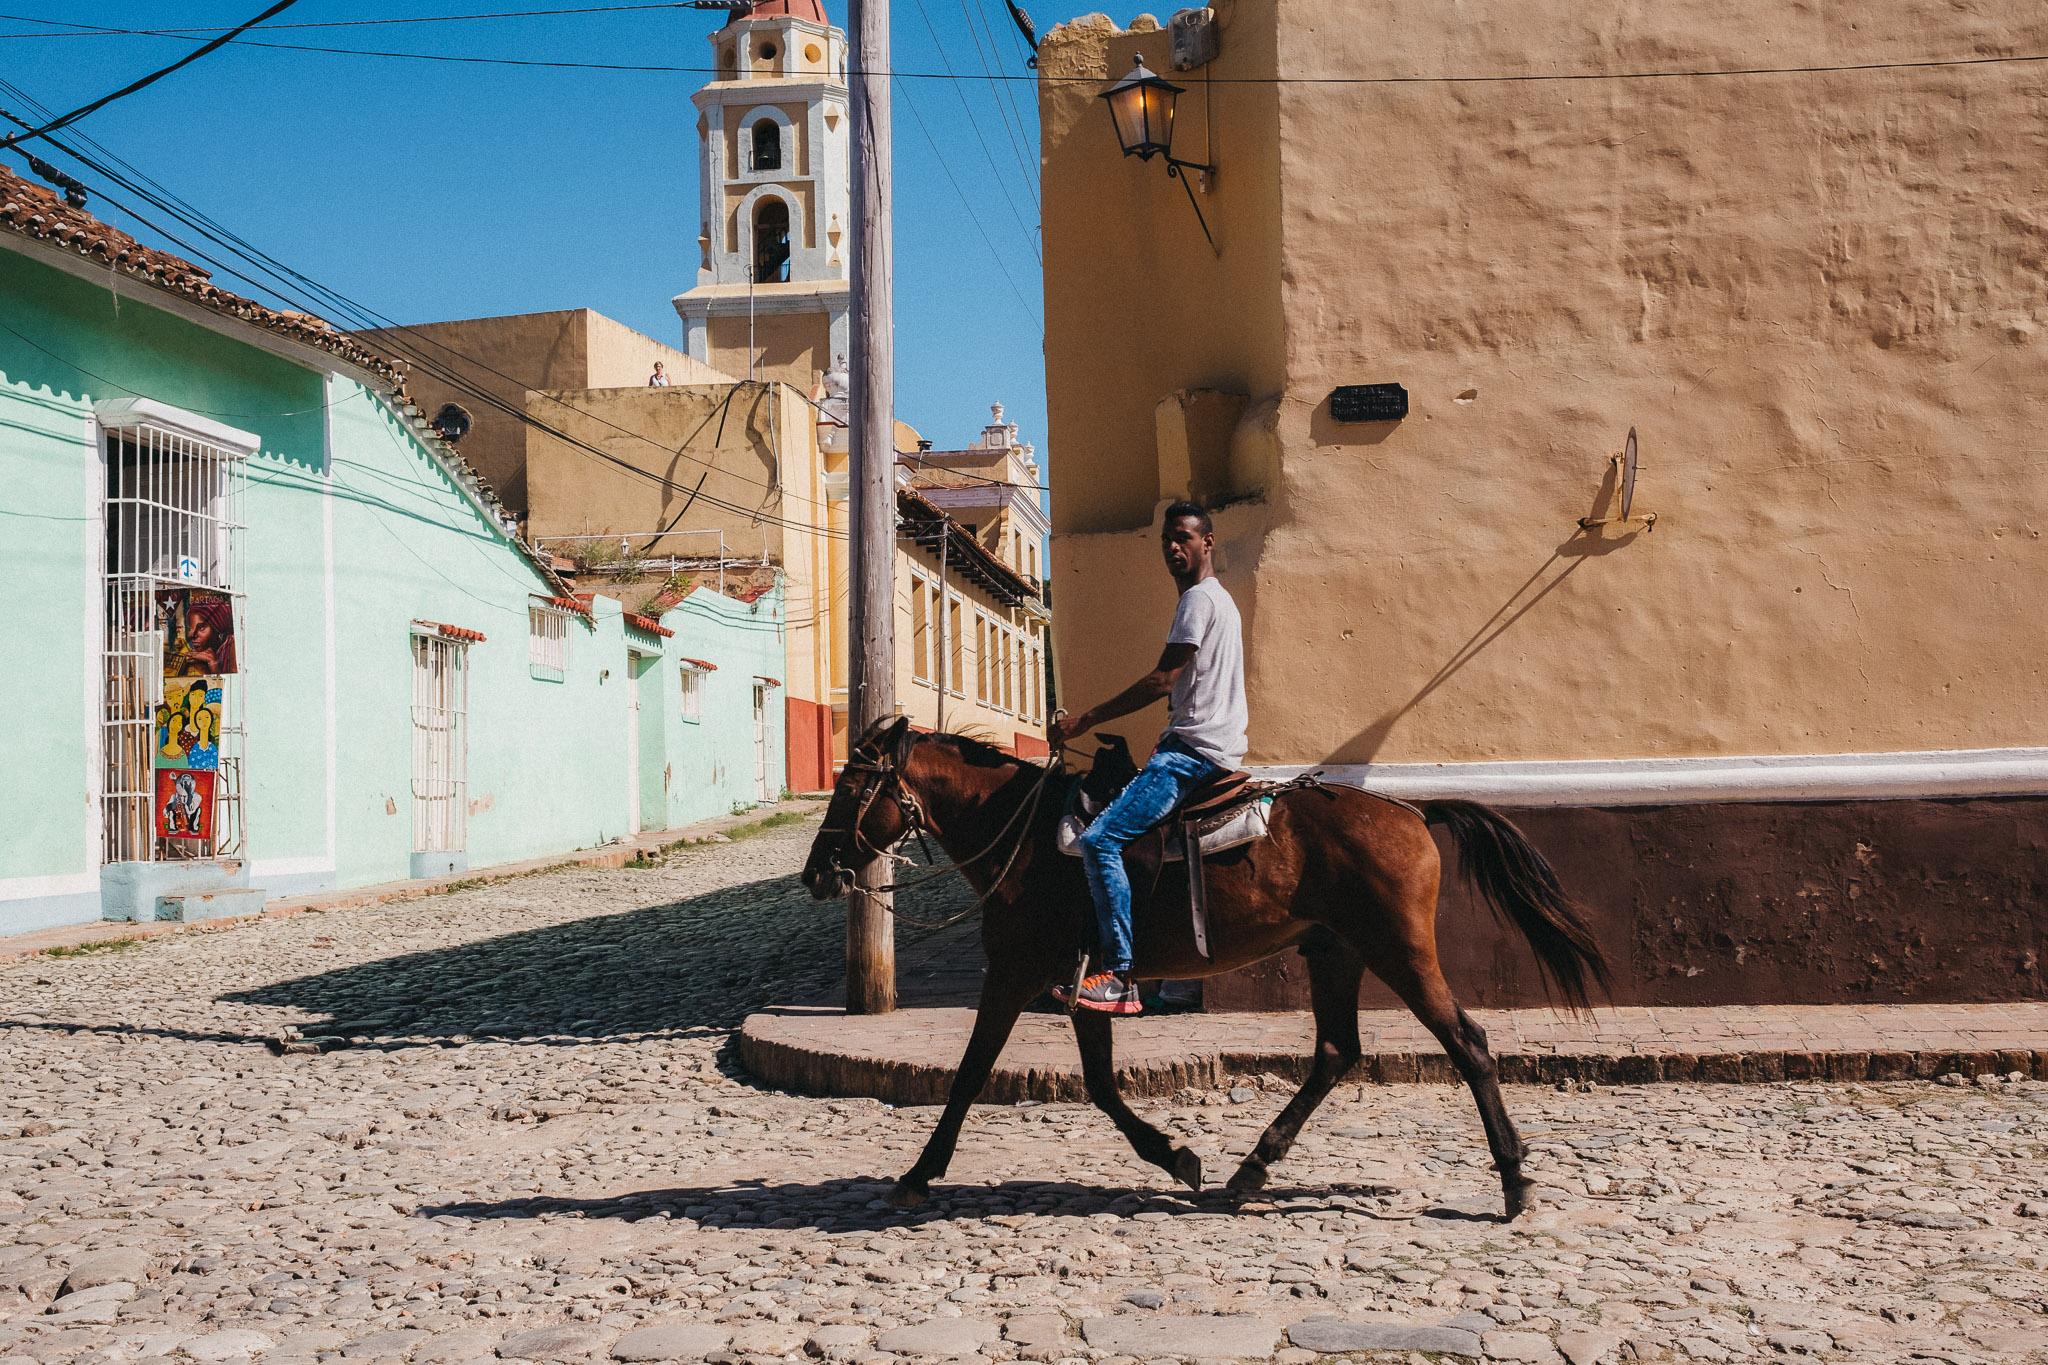 Cuba-2017-12-Trinidad-0048.jpg